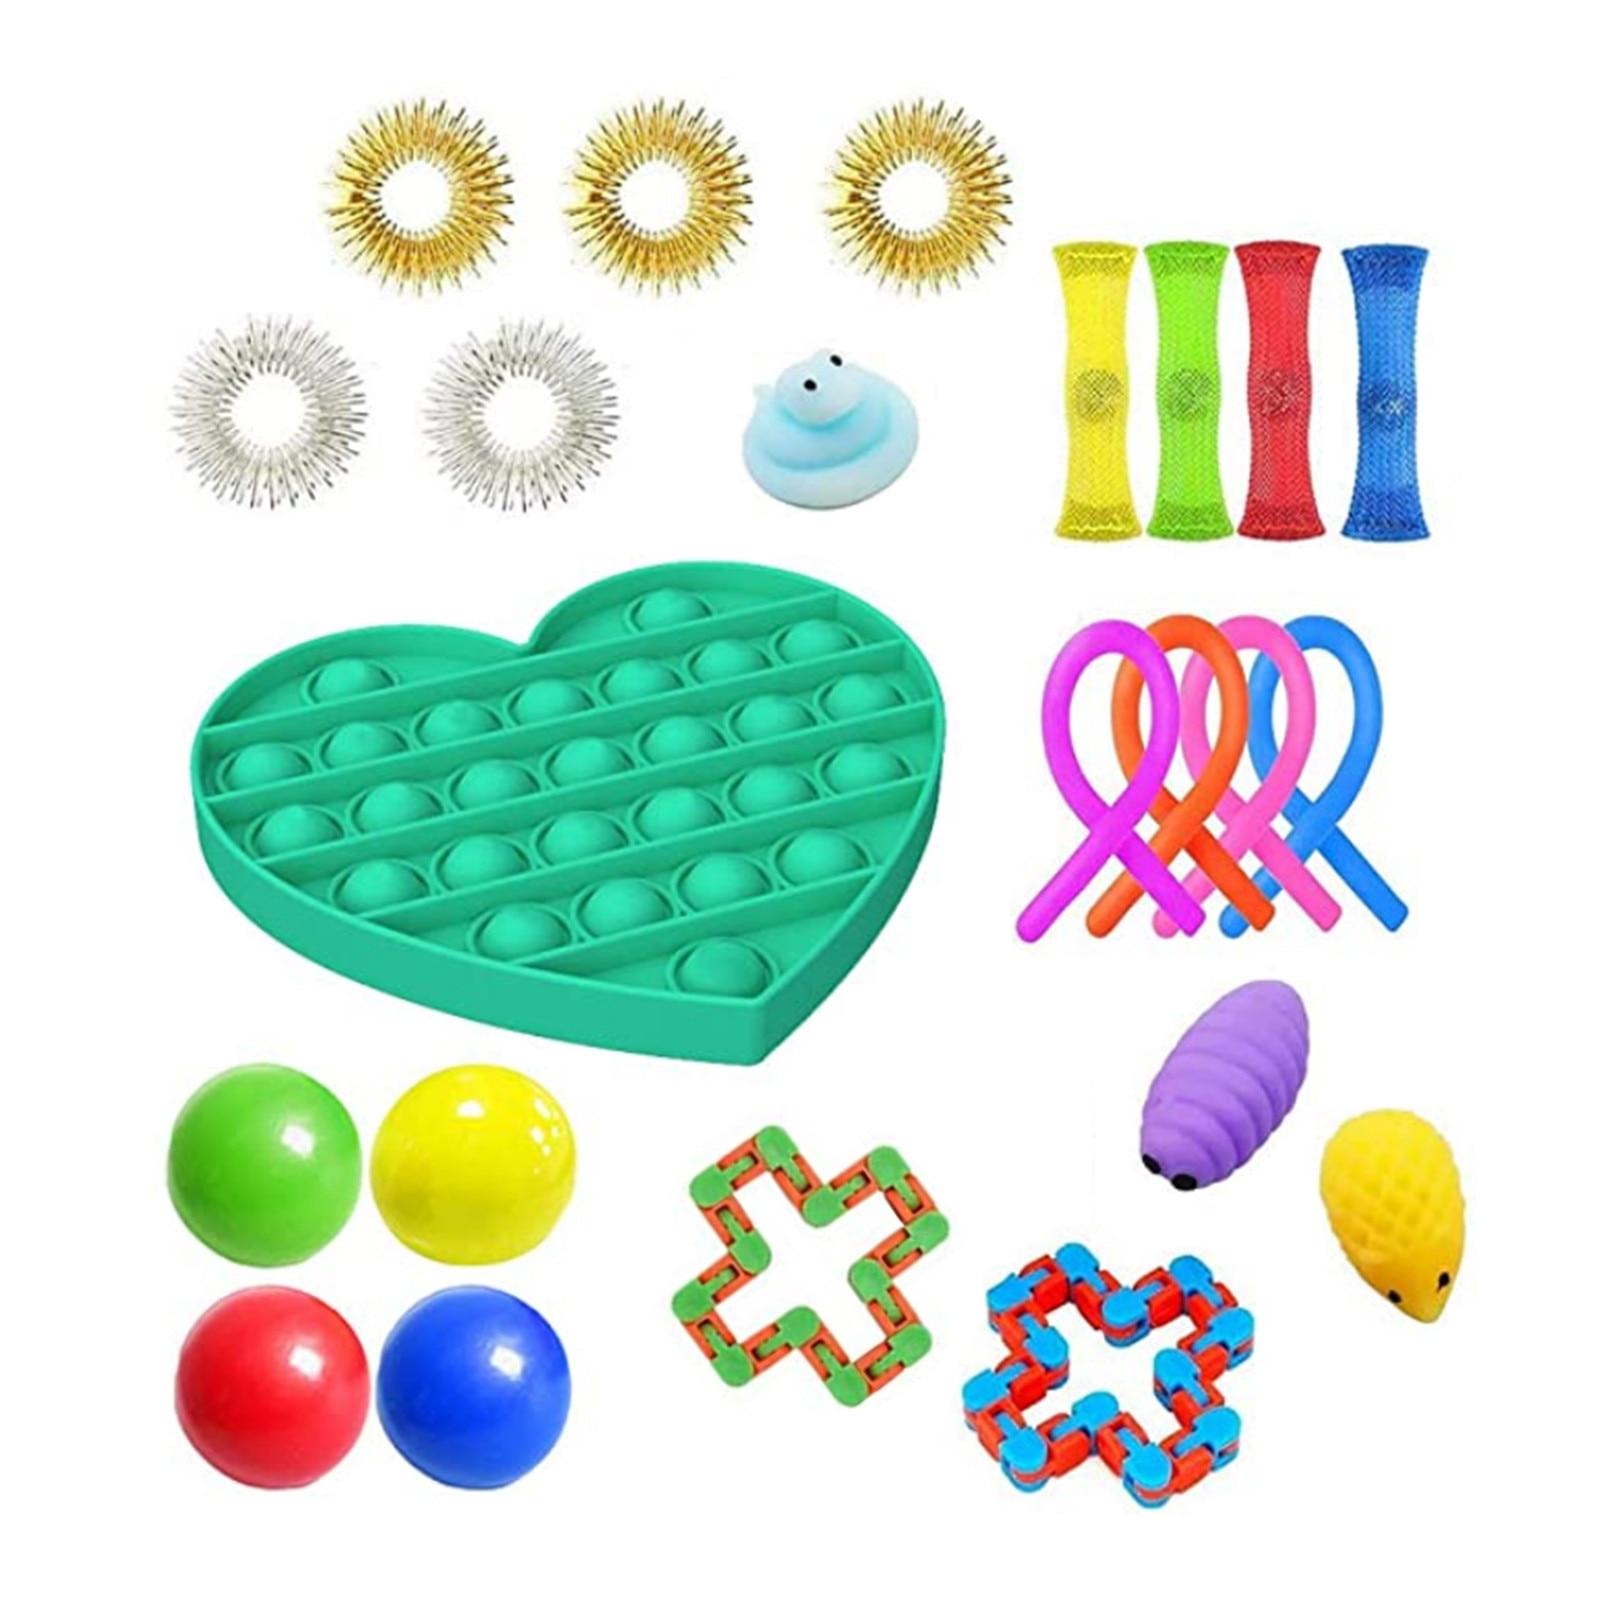 23 PCS Pack Sensory Fidget Toys Set Relieve Stress Toy Autism Anxiety Relief Stress Pop Bubble